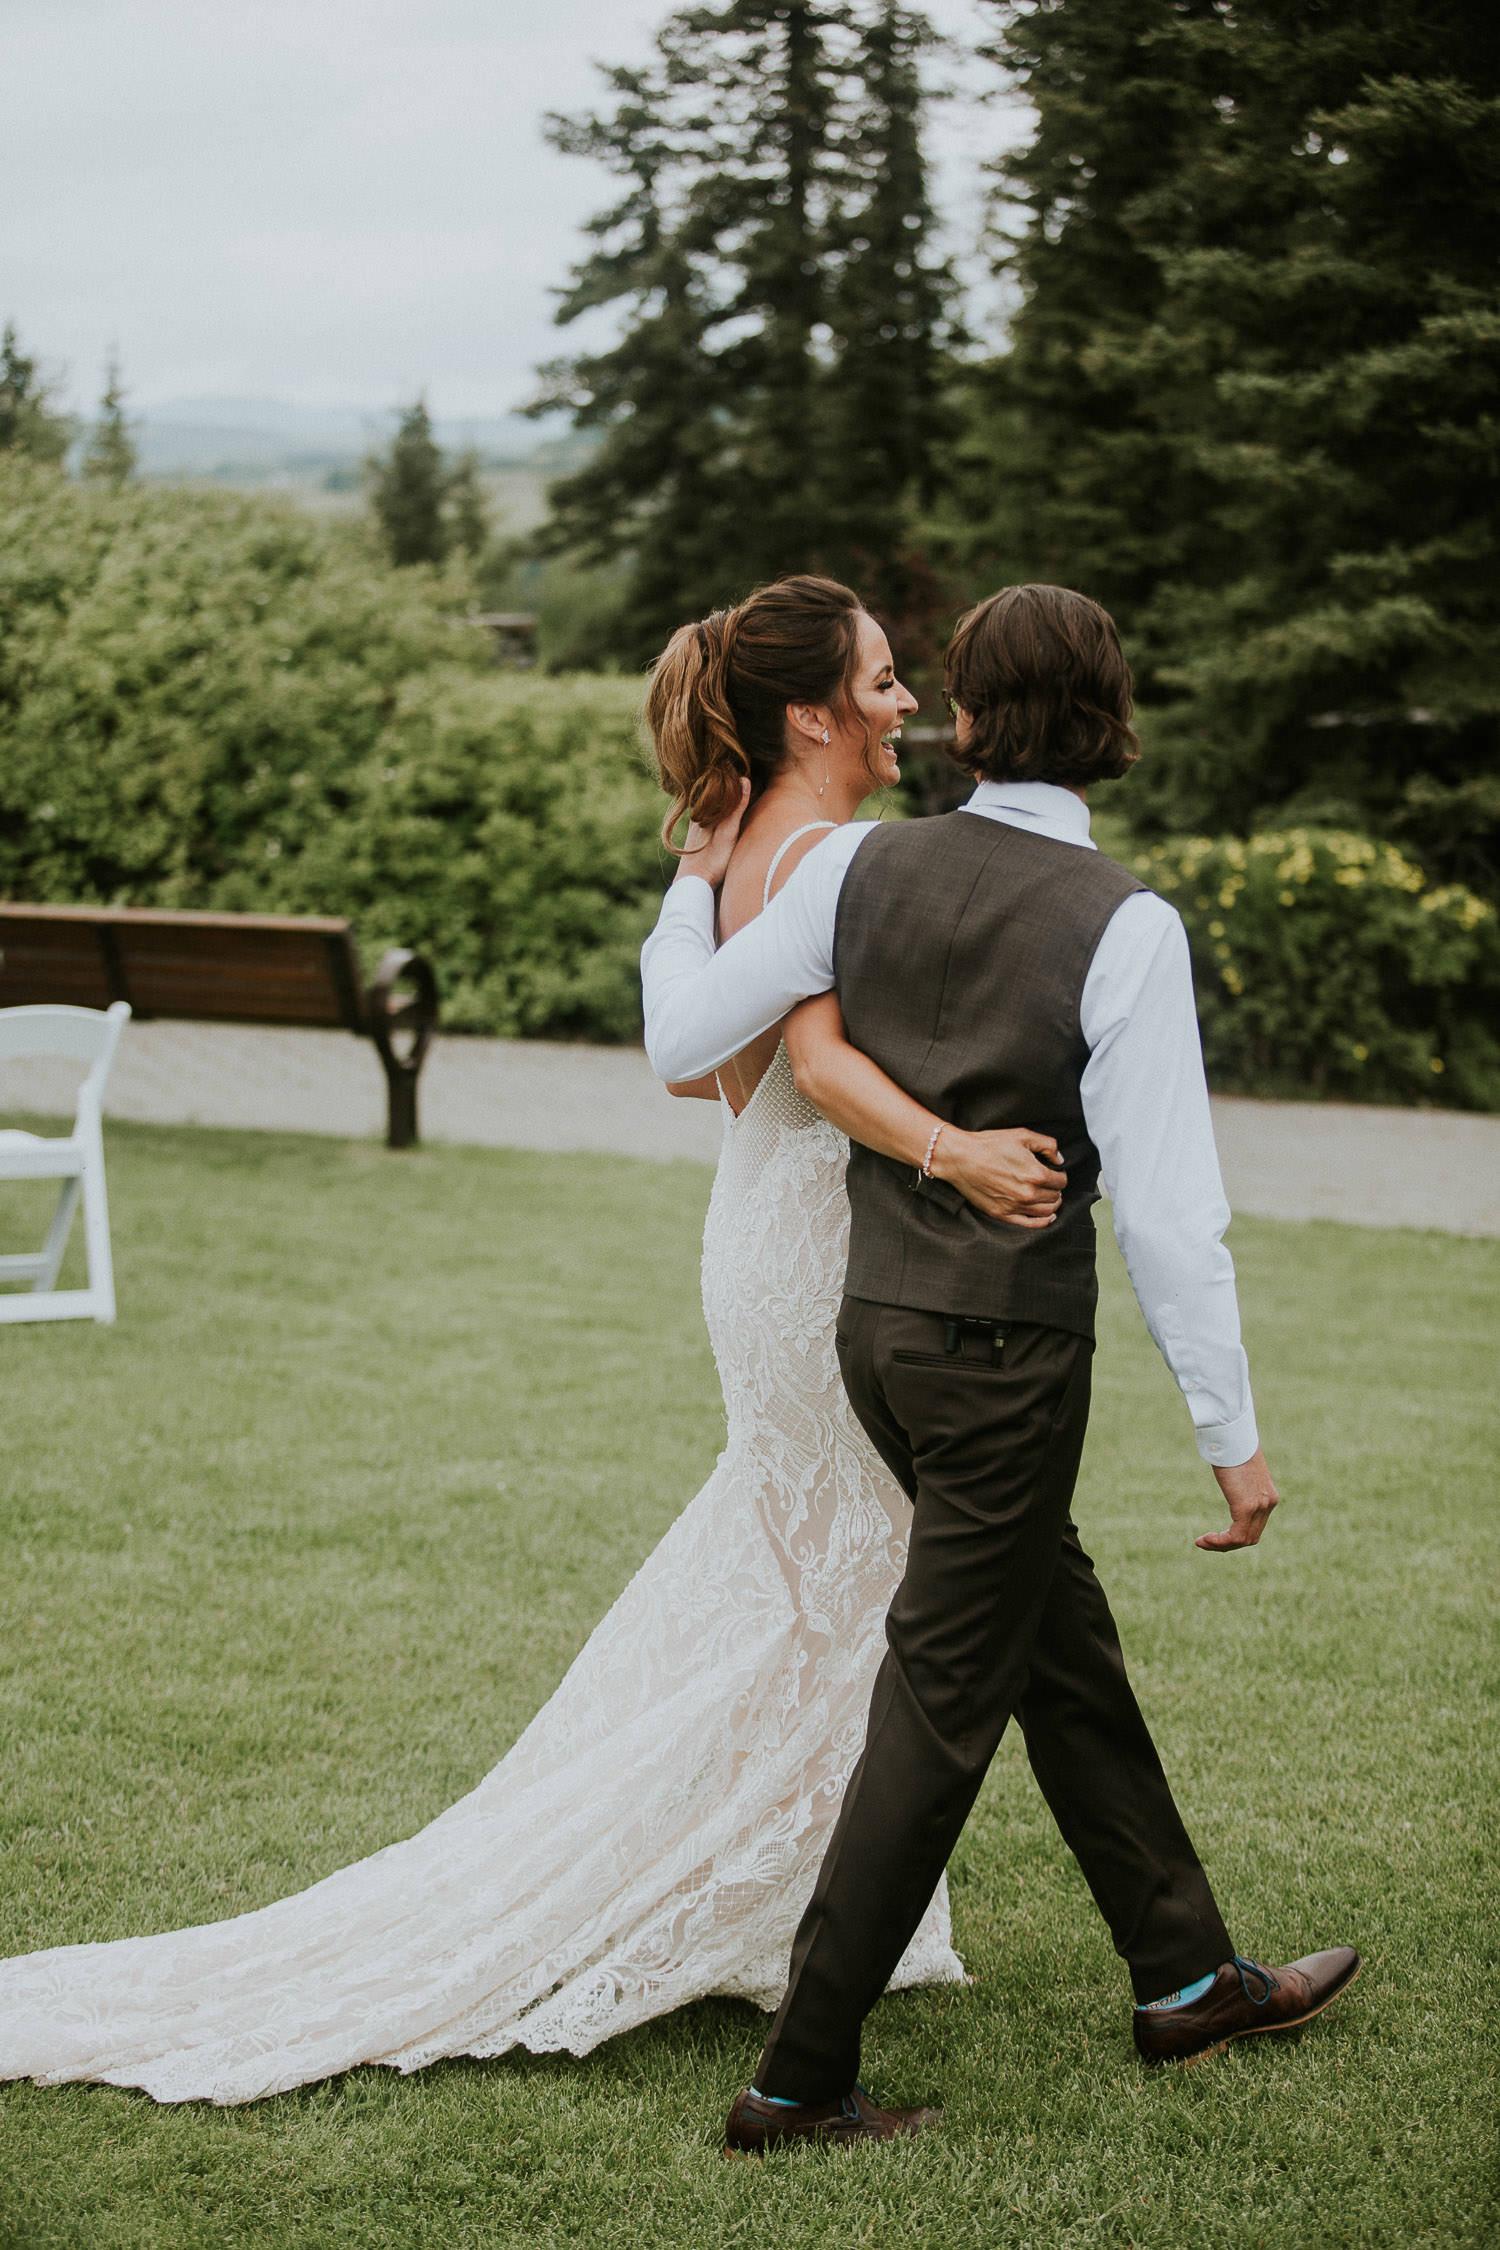 azuridge-estate-hotel-wedding-photographer-sarah-pukin-0169